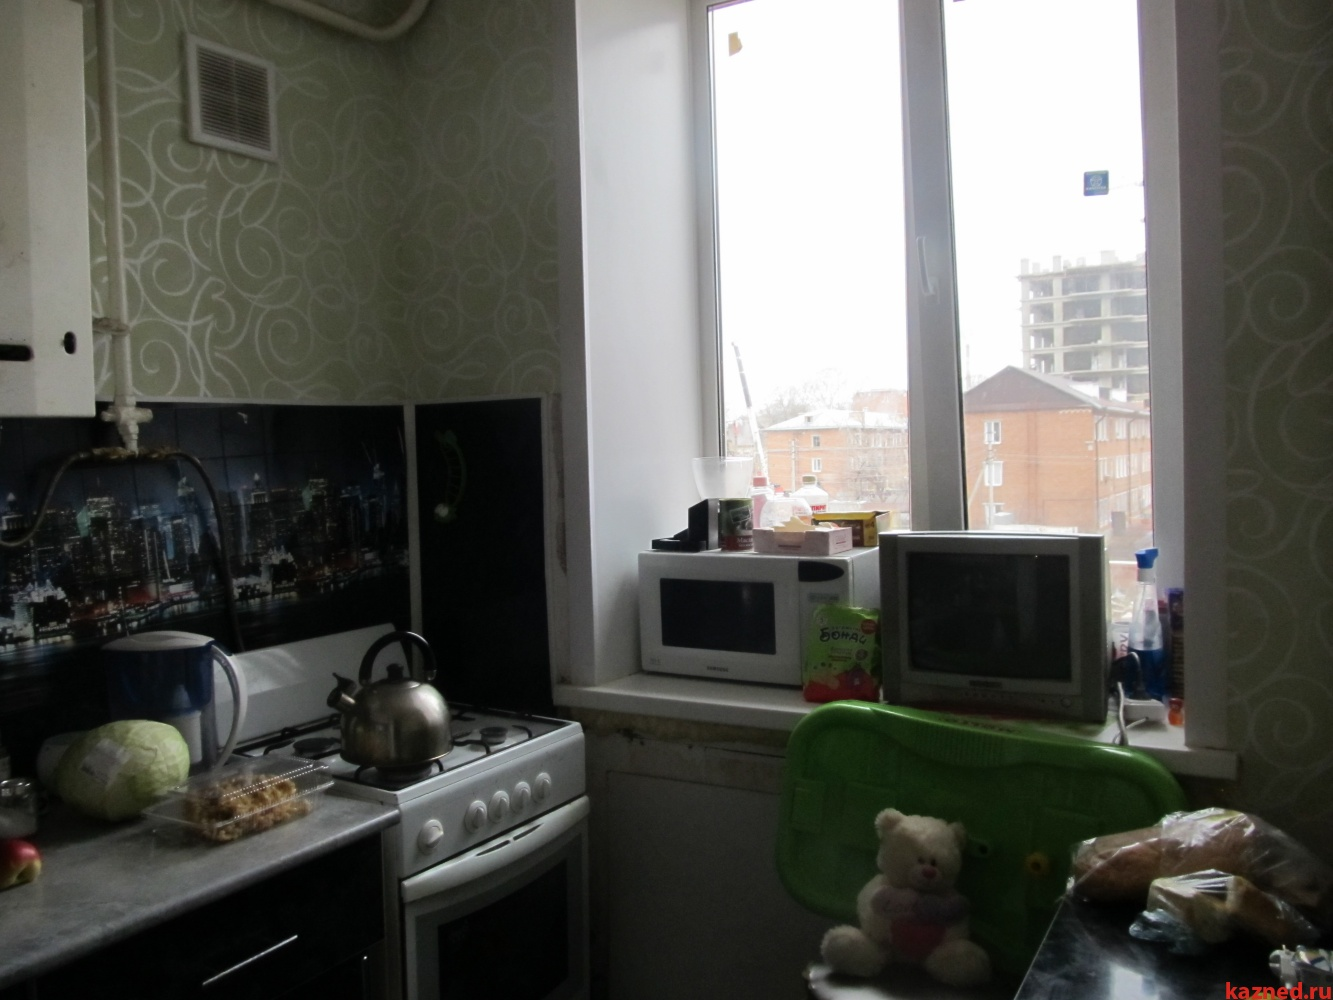 Продажа 2-к квартиры Тунакова, 41А, 39 м²  (миниатюра №3)